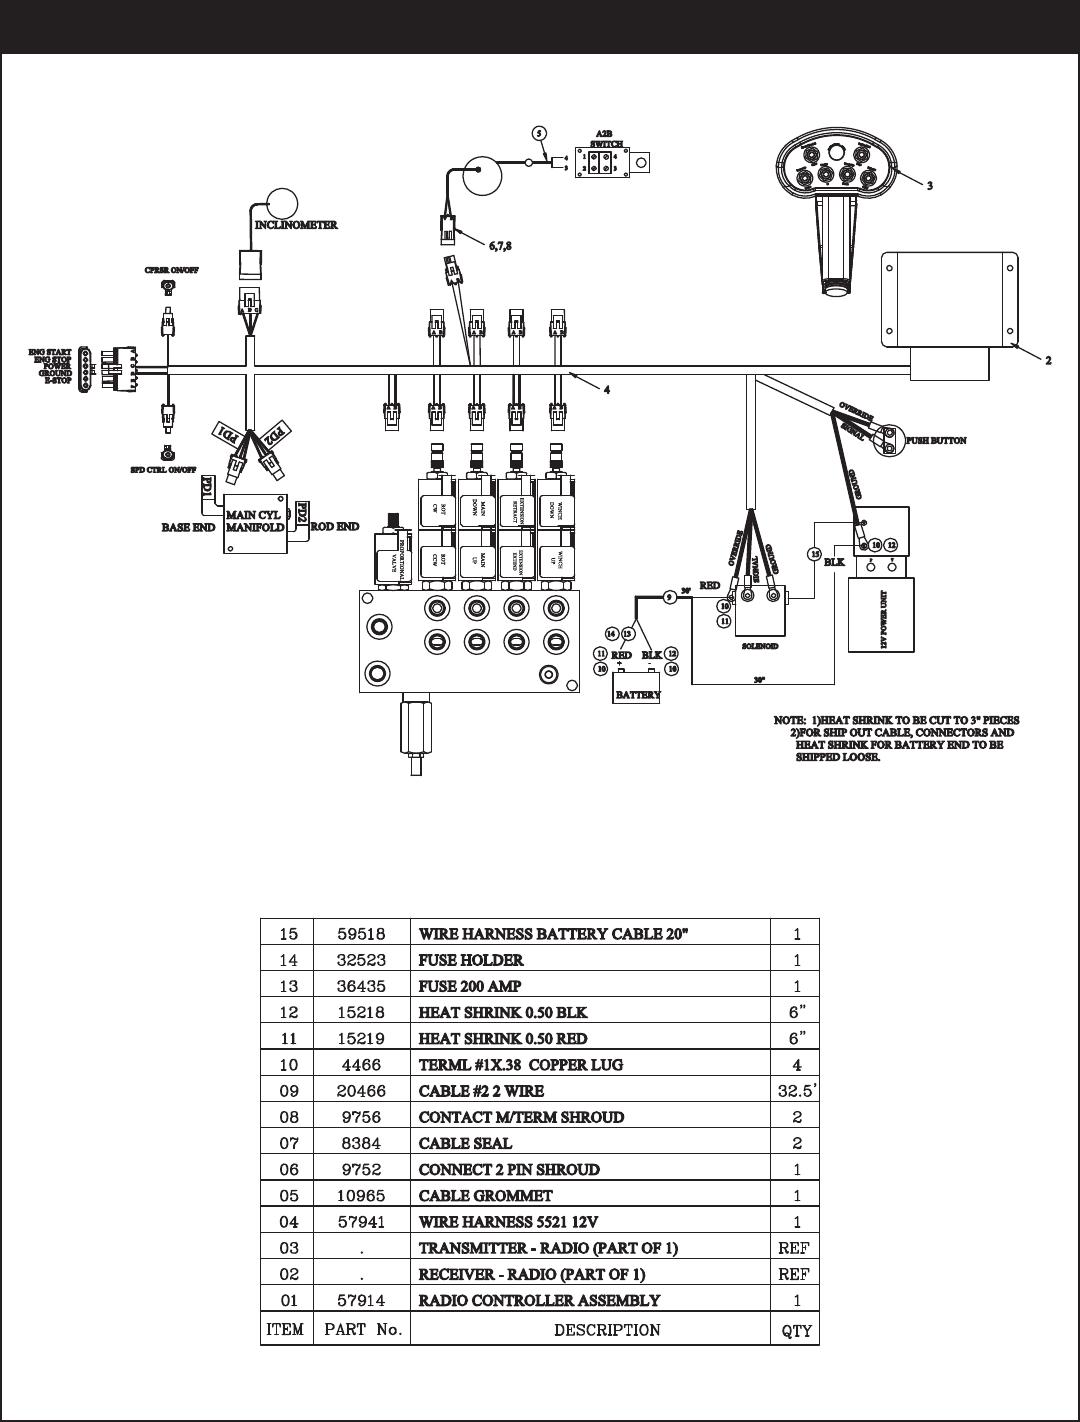 Stellar Industries 5521 Users Manual Telescopic Crane Inclinometer Wiring Diagram Installation